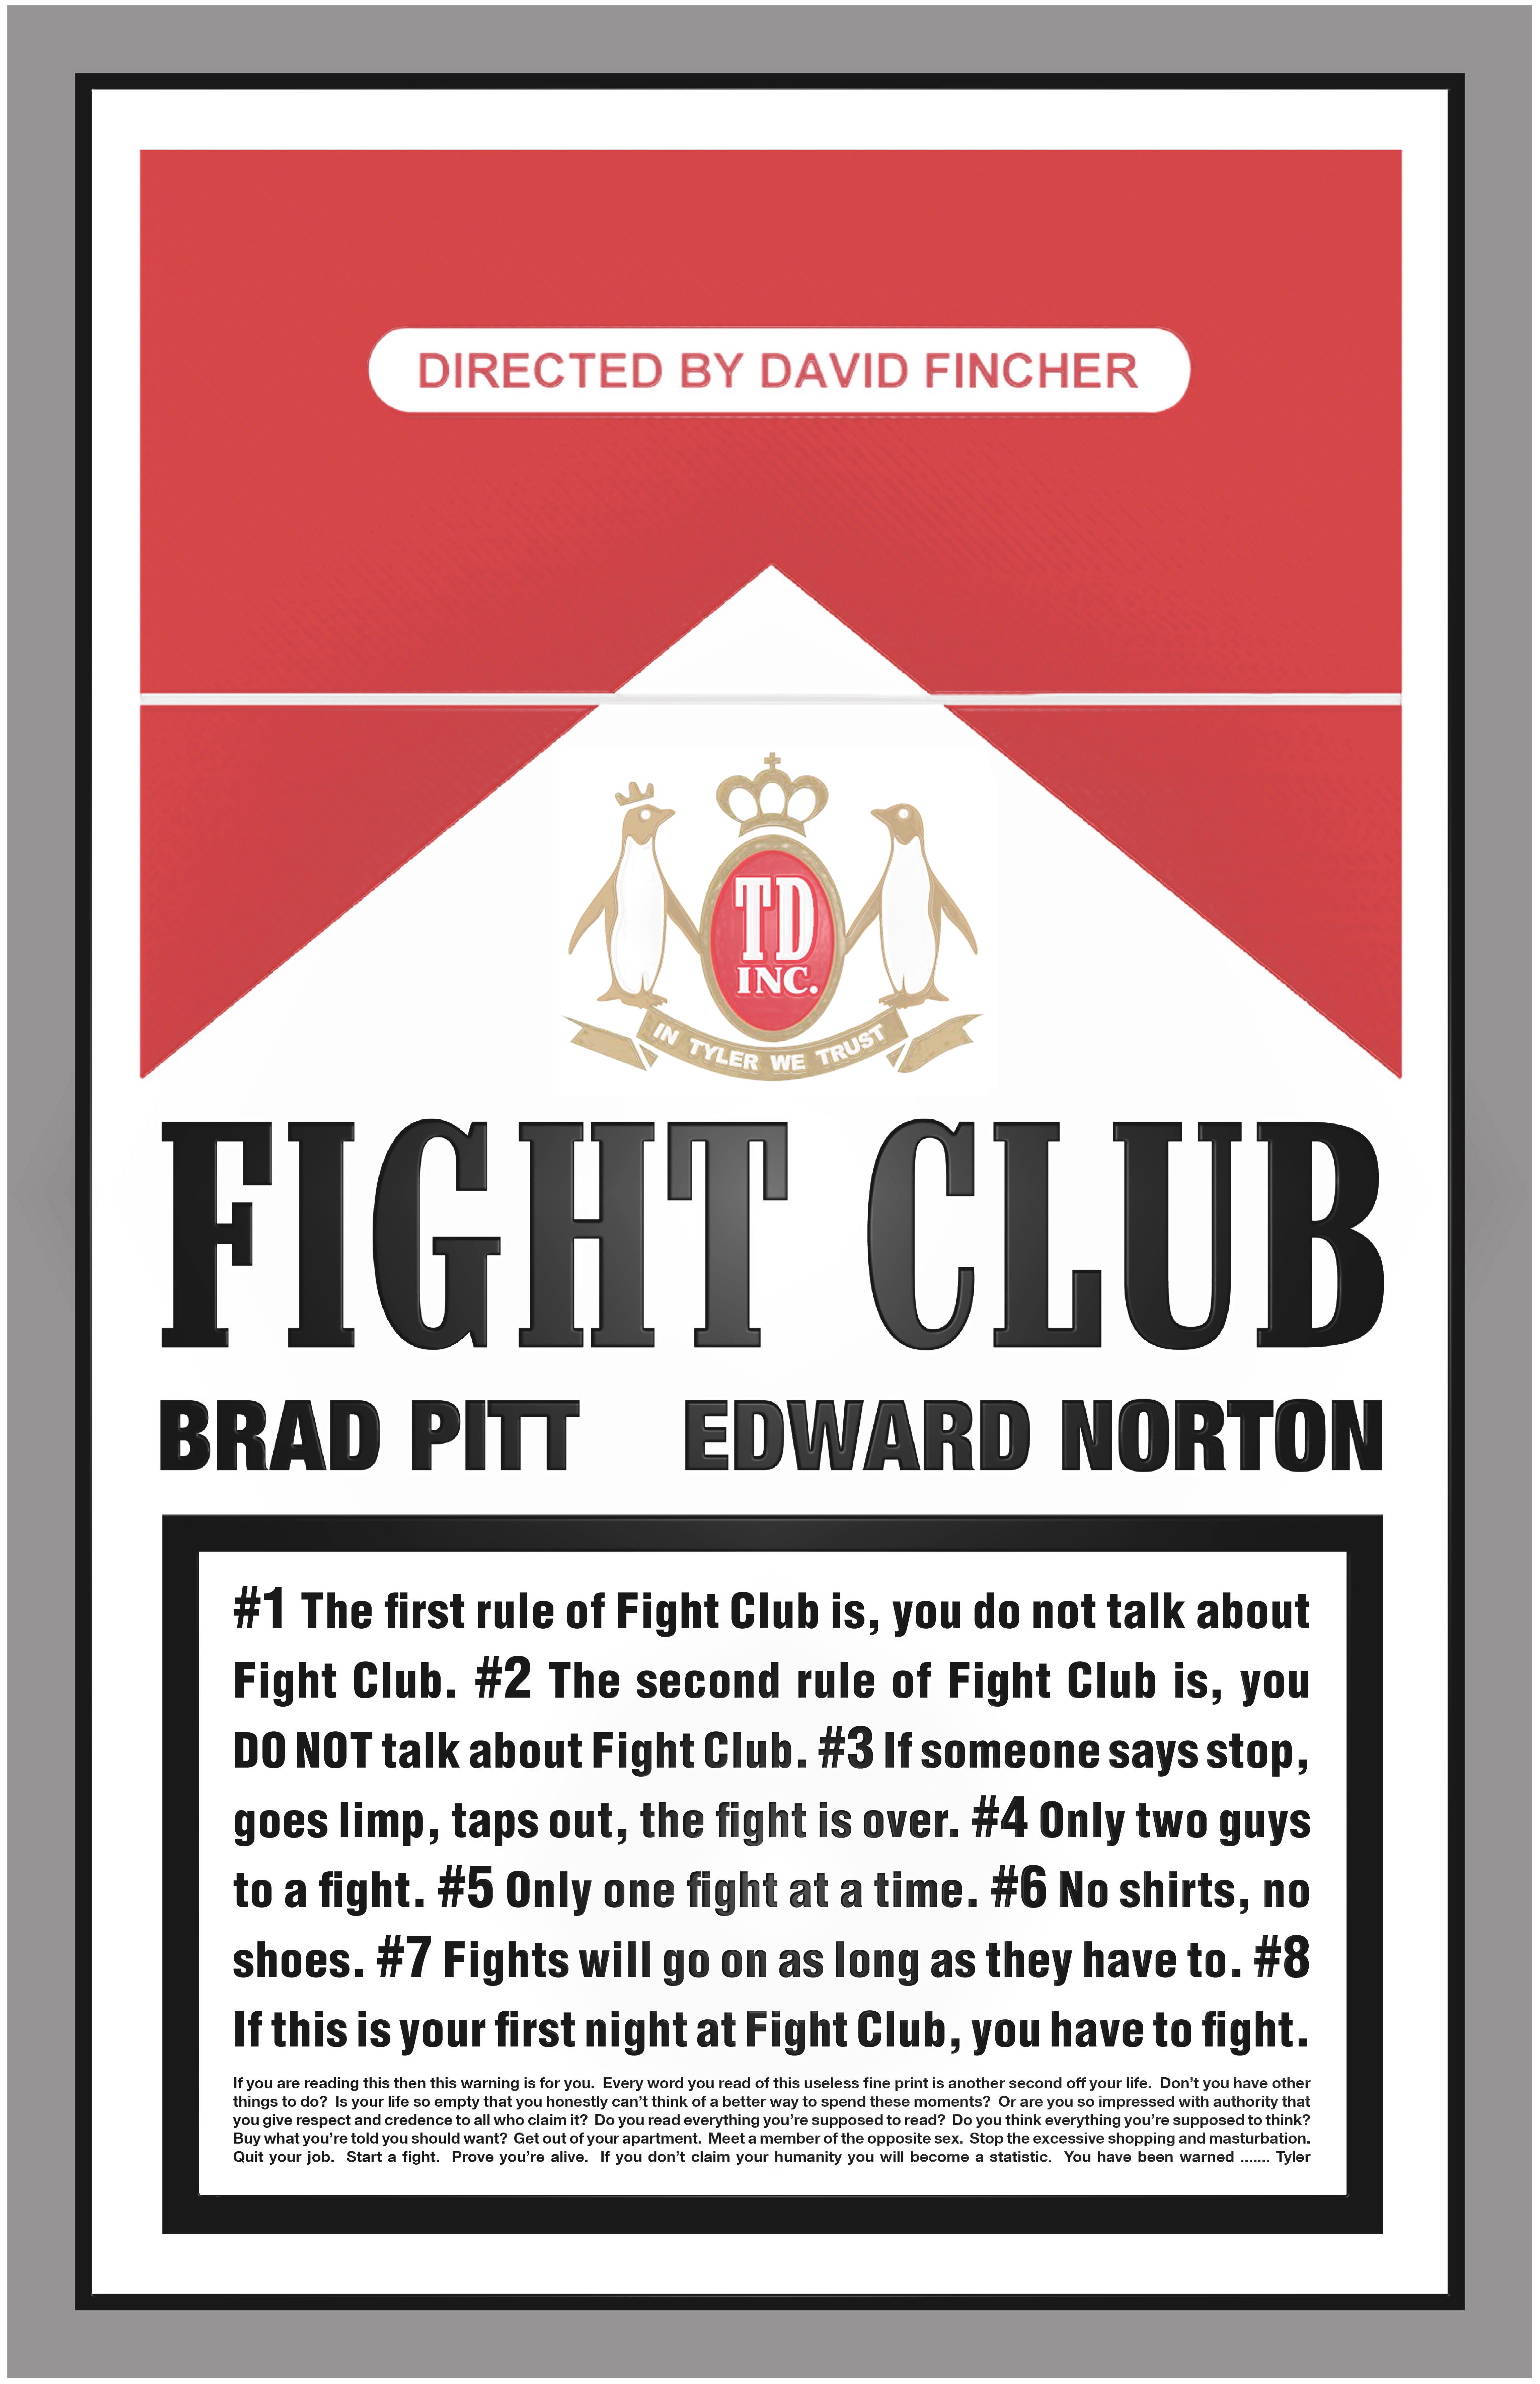 fight club poster the portfolio of ross hoddinott. Black Bedroom Furniture Sets. Home Design Ideas